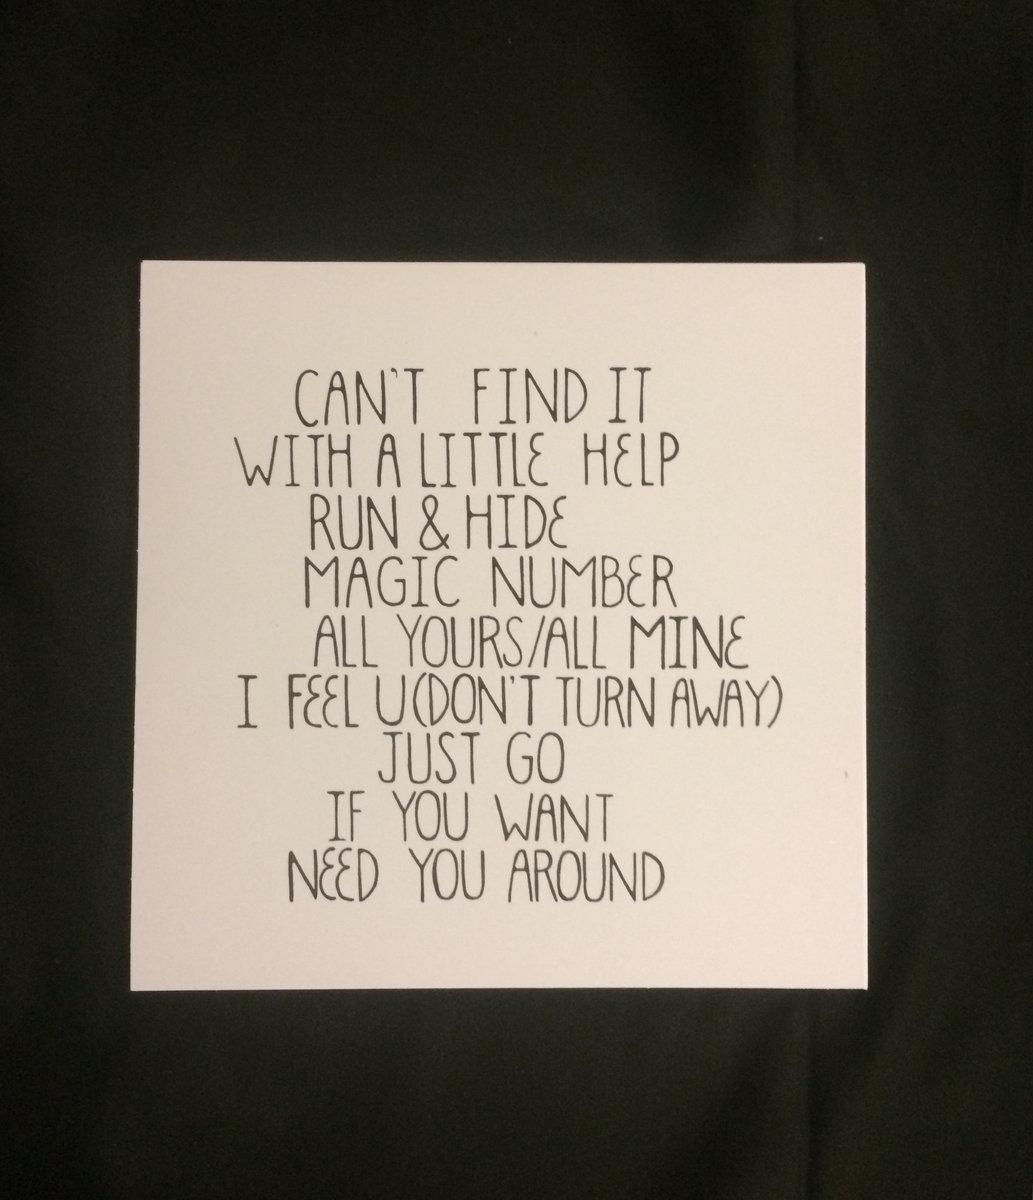 Need You Around | Sunbathe